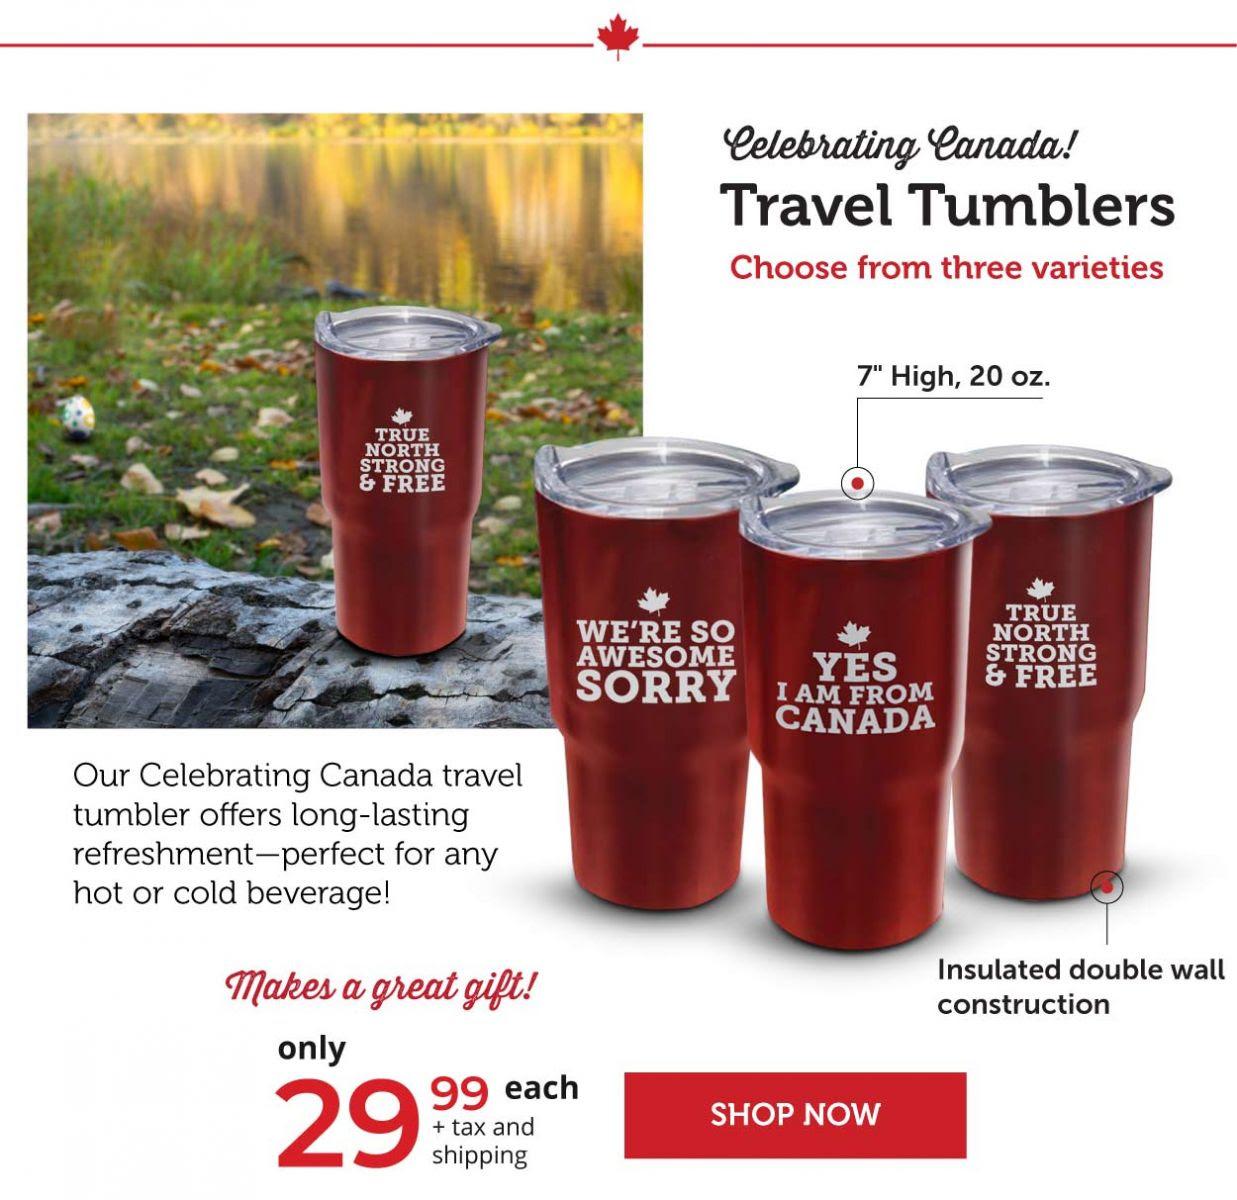 Travel Tumbler